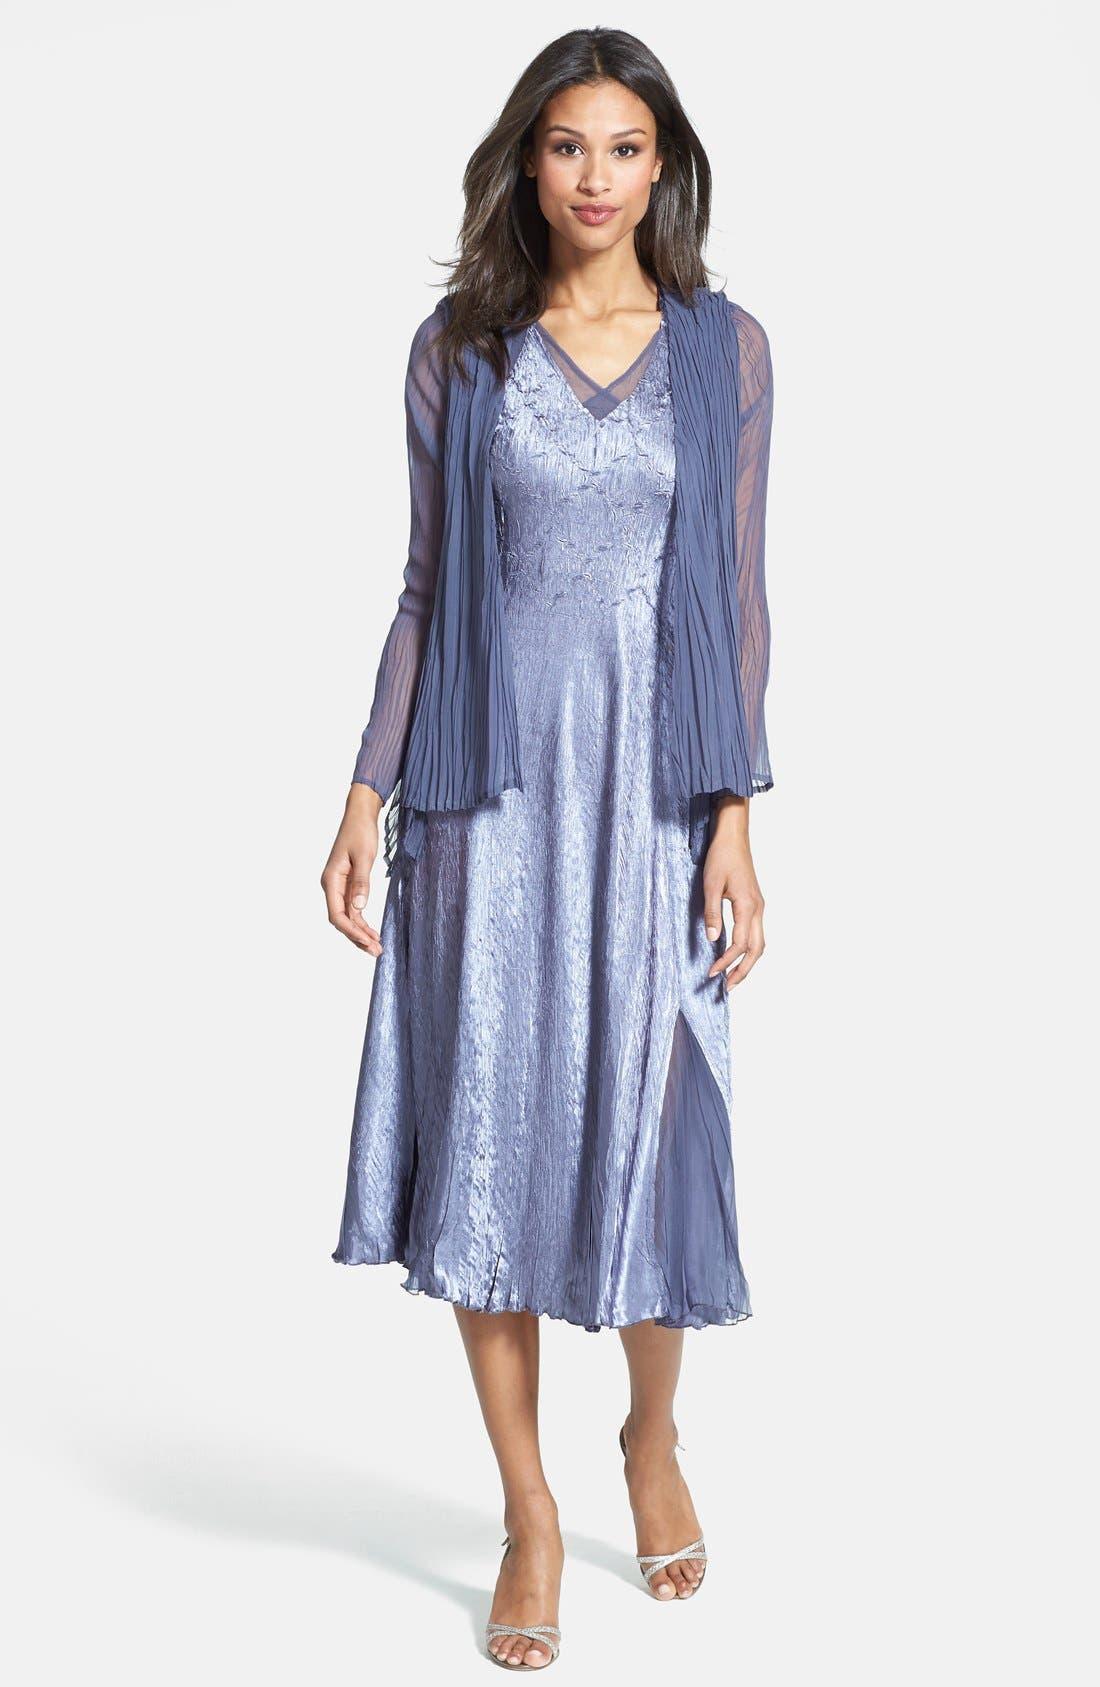 Main Image - Komarov Sleeveless Satin Dress & Chiffon Jacket